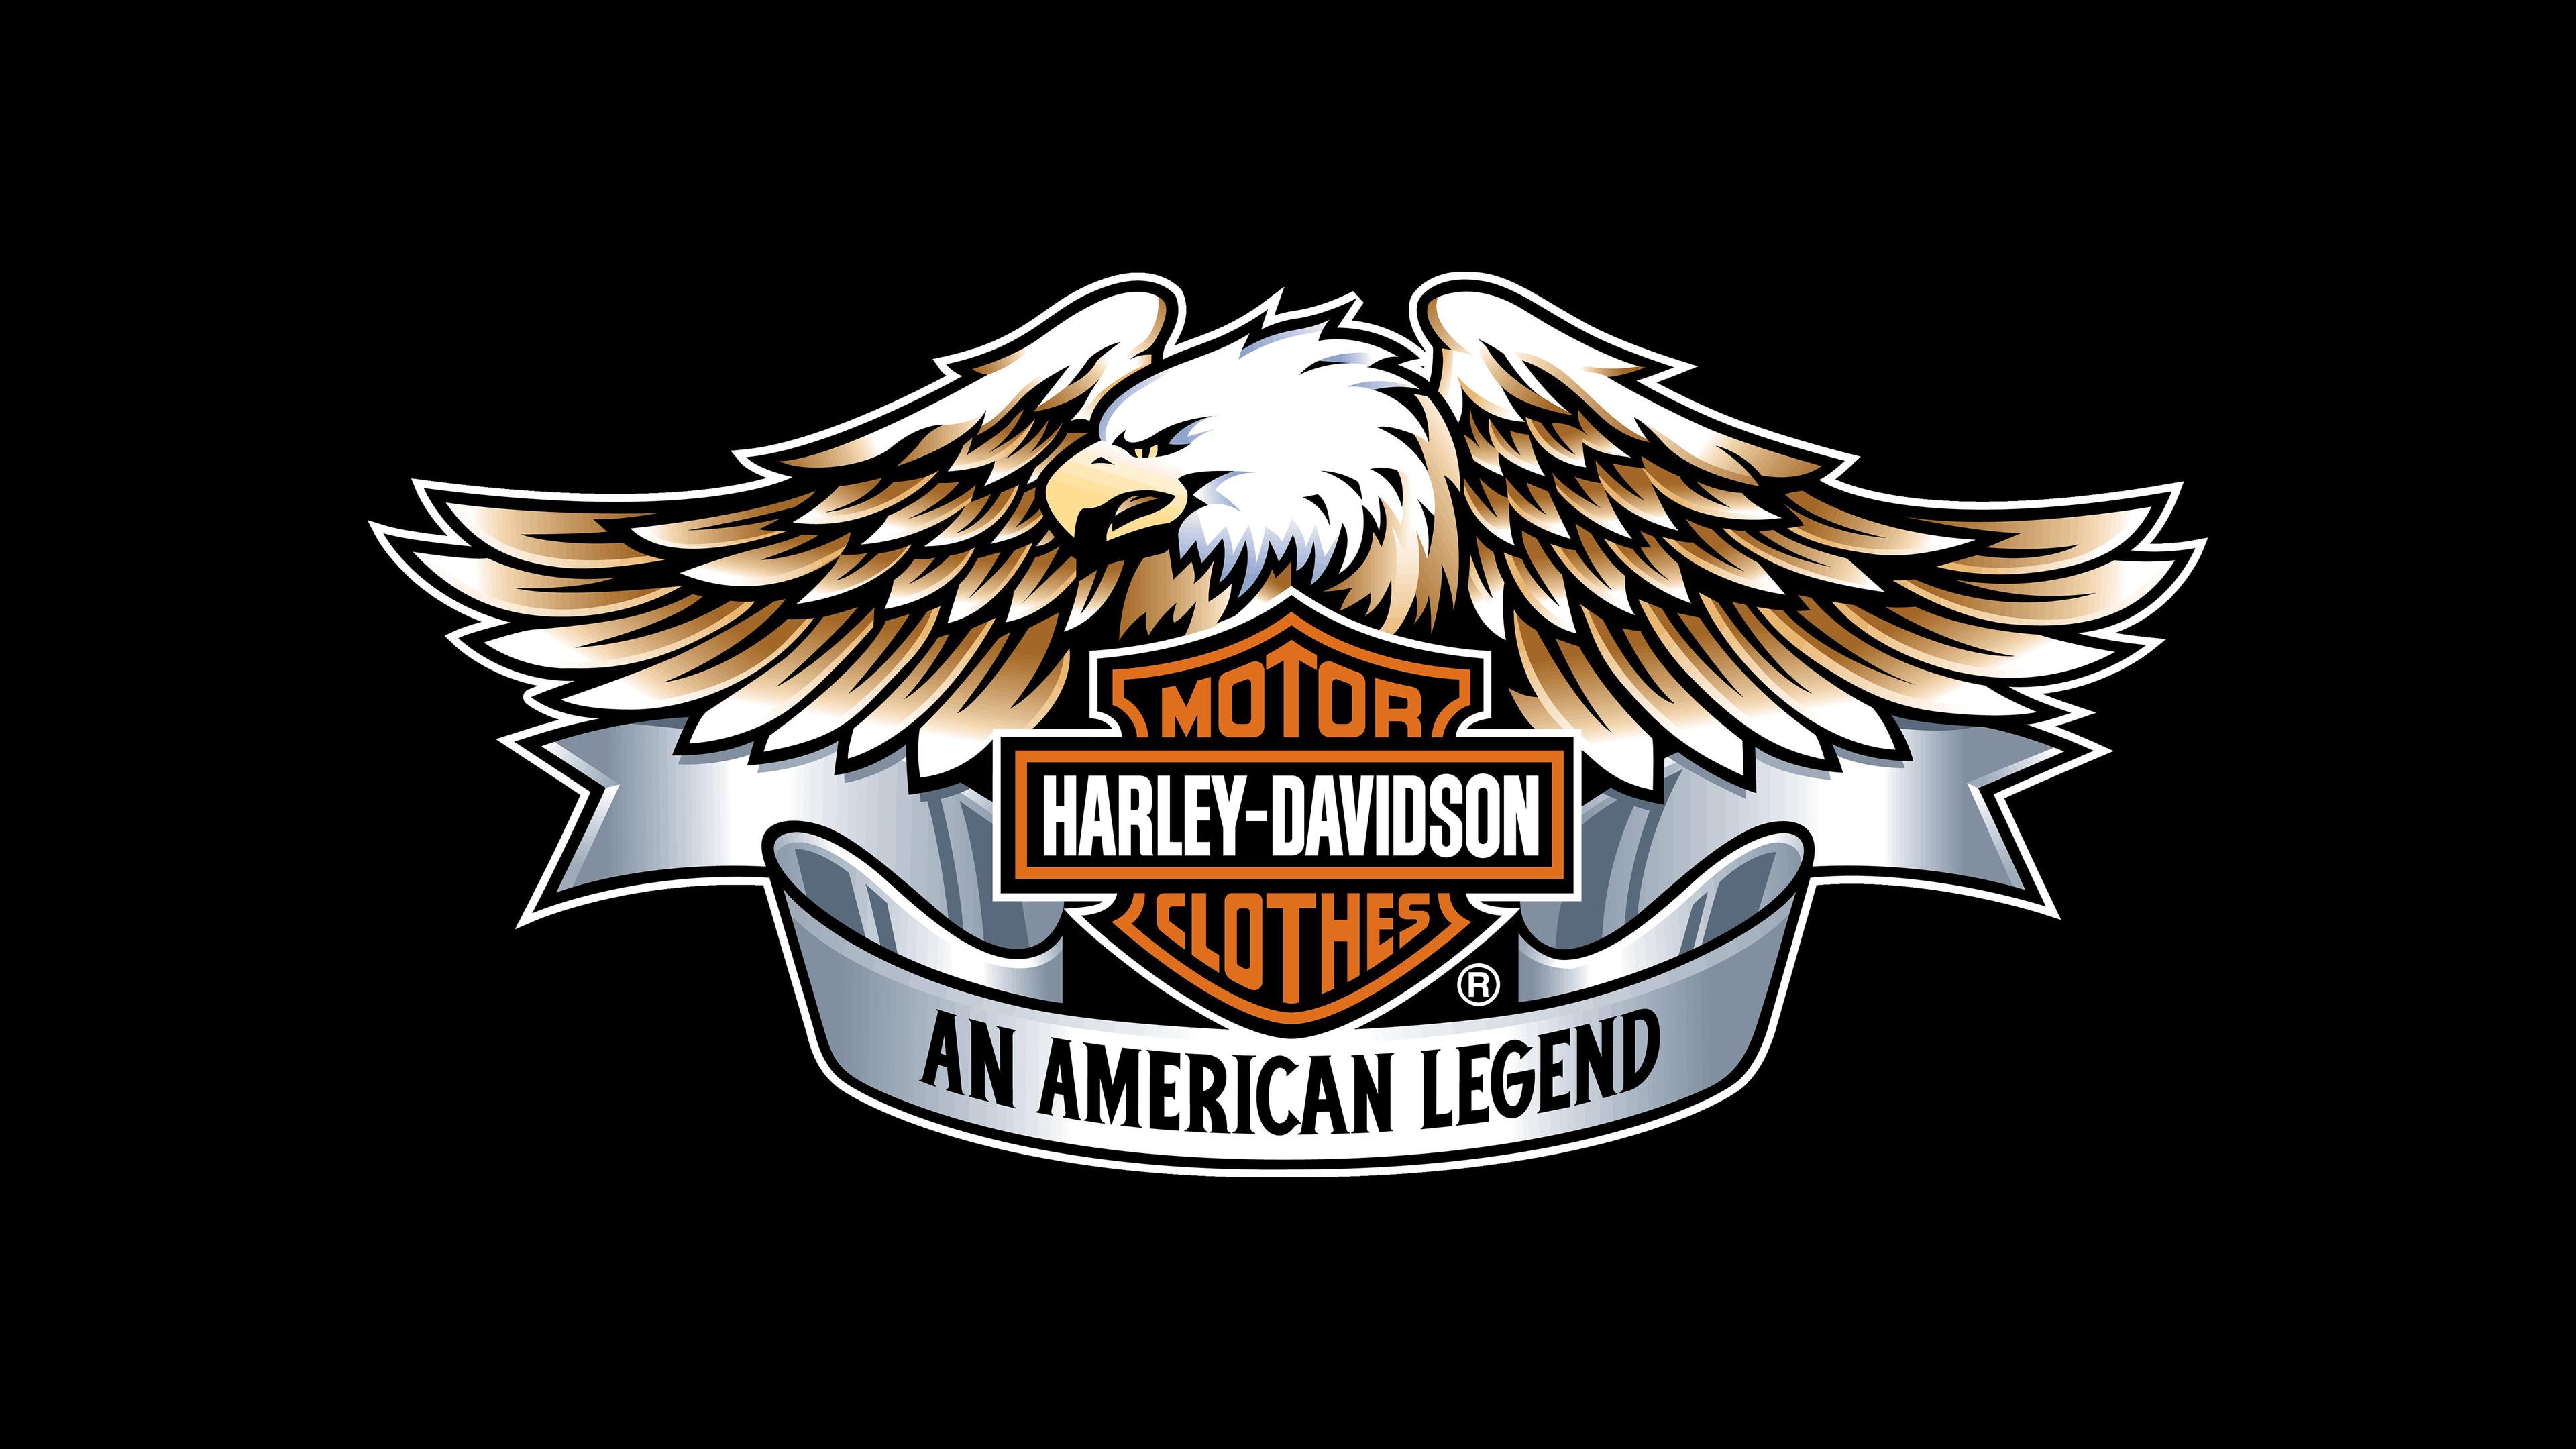 harley davidson eagle logo 4k 1536316497 - Harley Davidson Eagle Logo 4k - logo wallpapers, hd-wallpapers, harley davidson wallpapers, eagle wallpapers, bikes wallpapers, 5k wallpapers, 4k-wallpapers